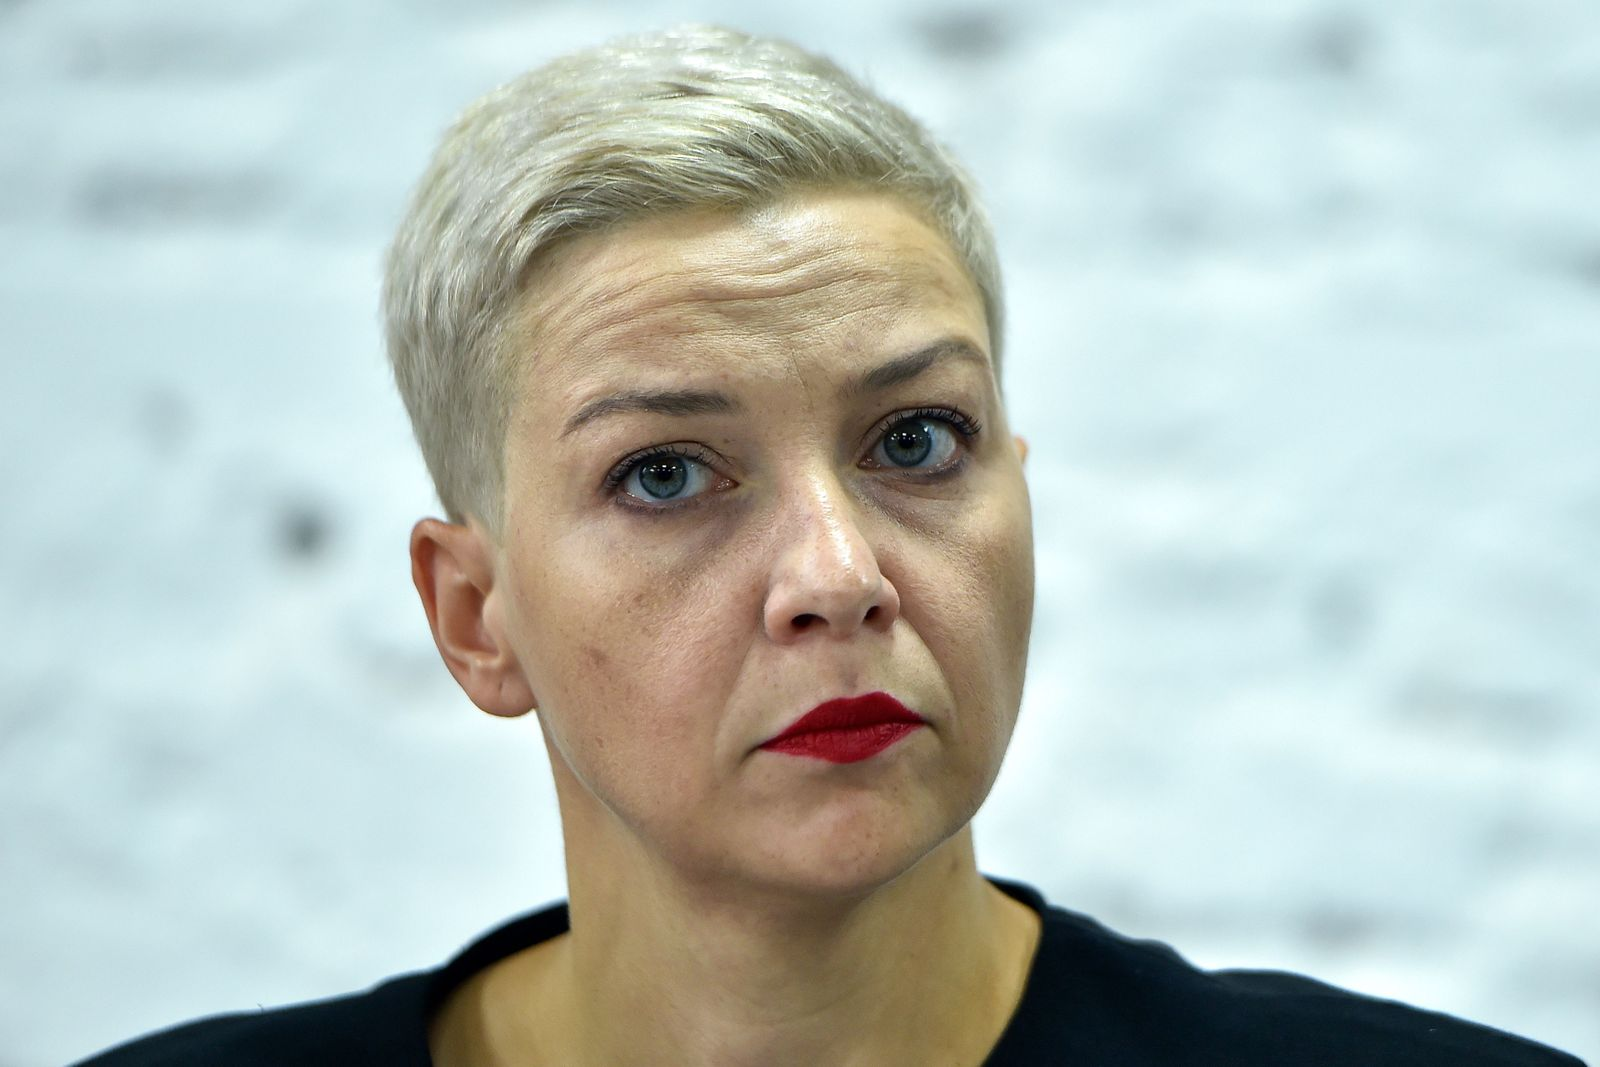 FILES-BELARUS-POLITICS-DEMONSTRATION-POLICE-OPPOSITION